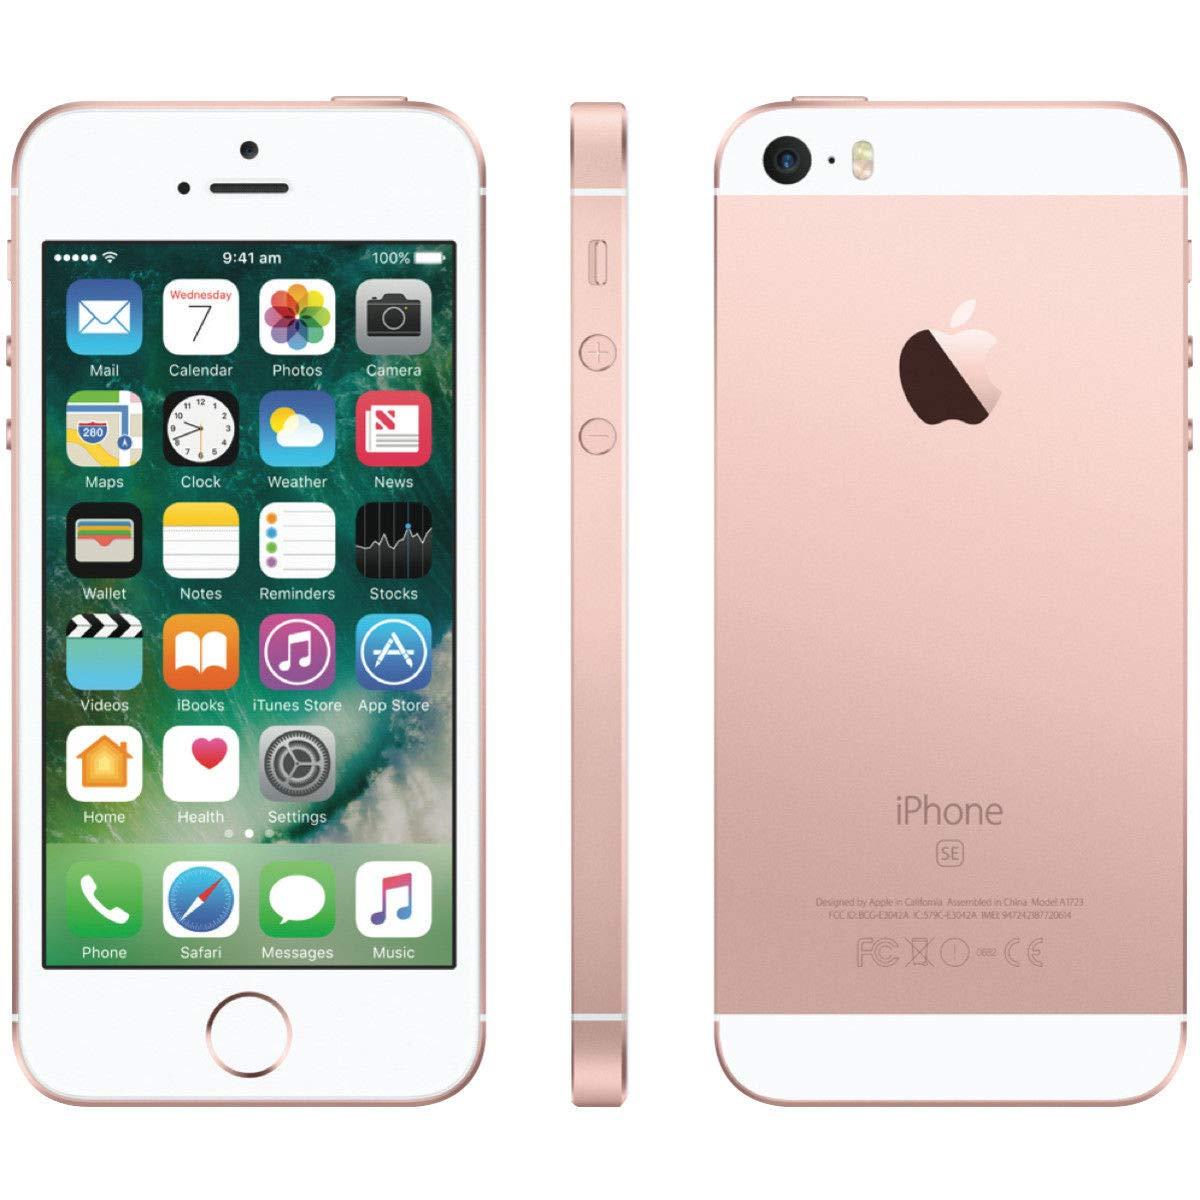 Apple iPhone SE, 16GB, Rose Gold - For Sprint (Renewed)